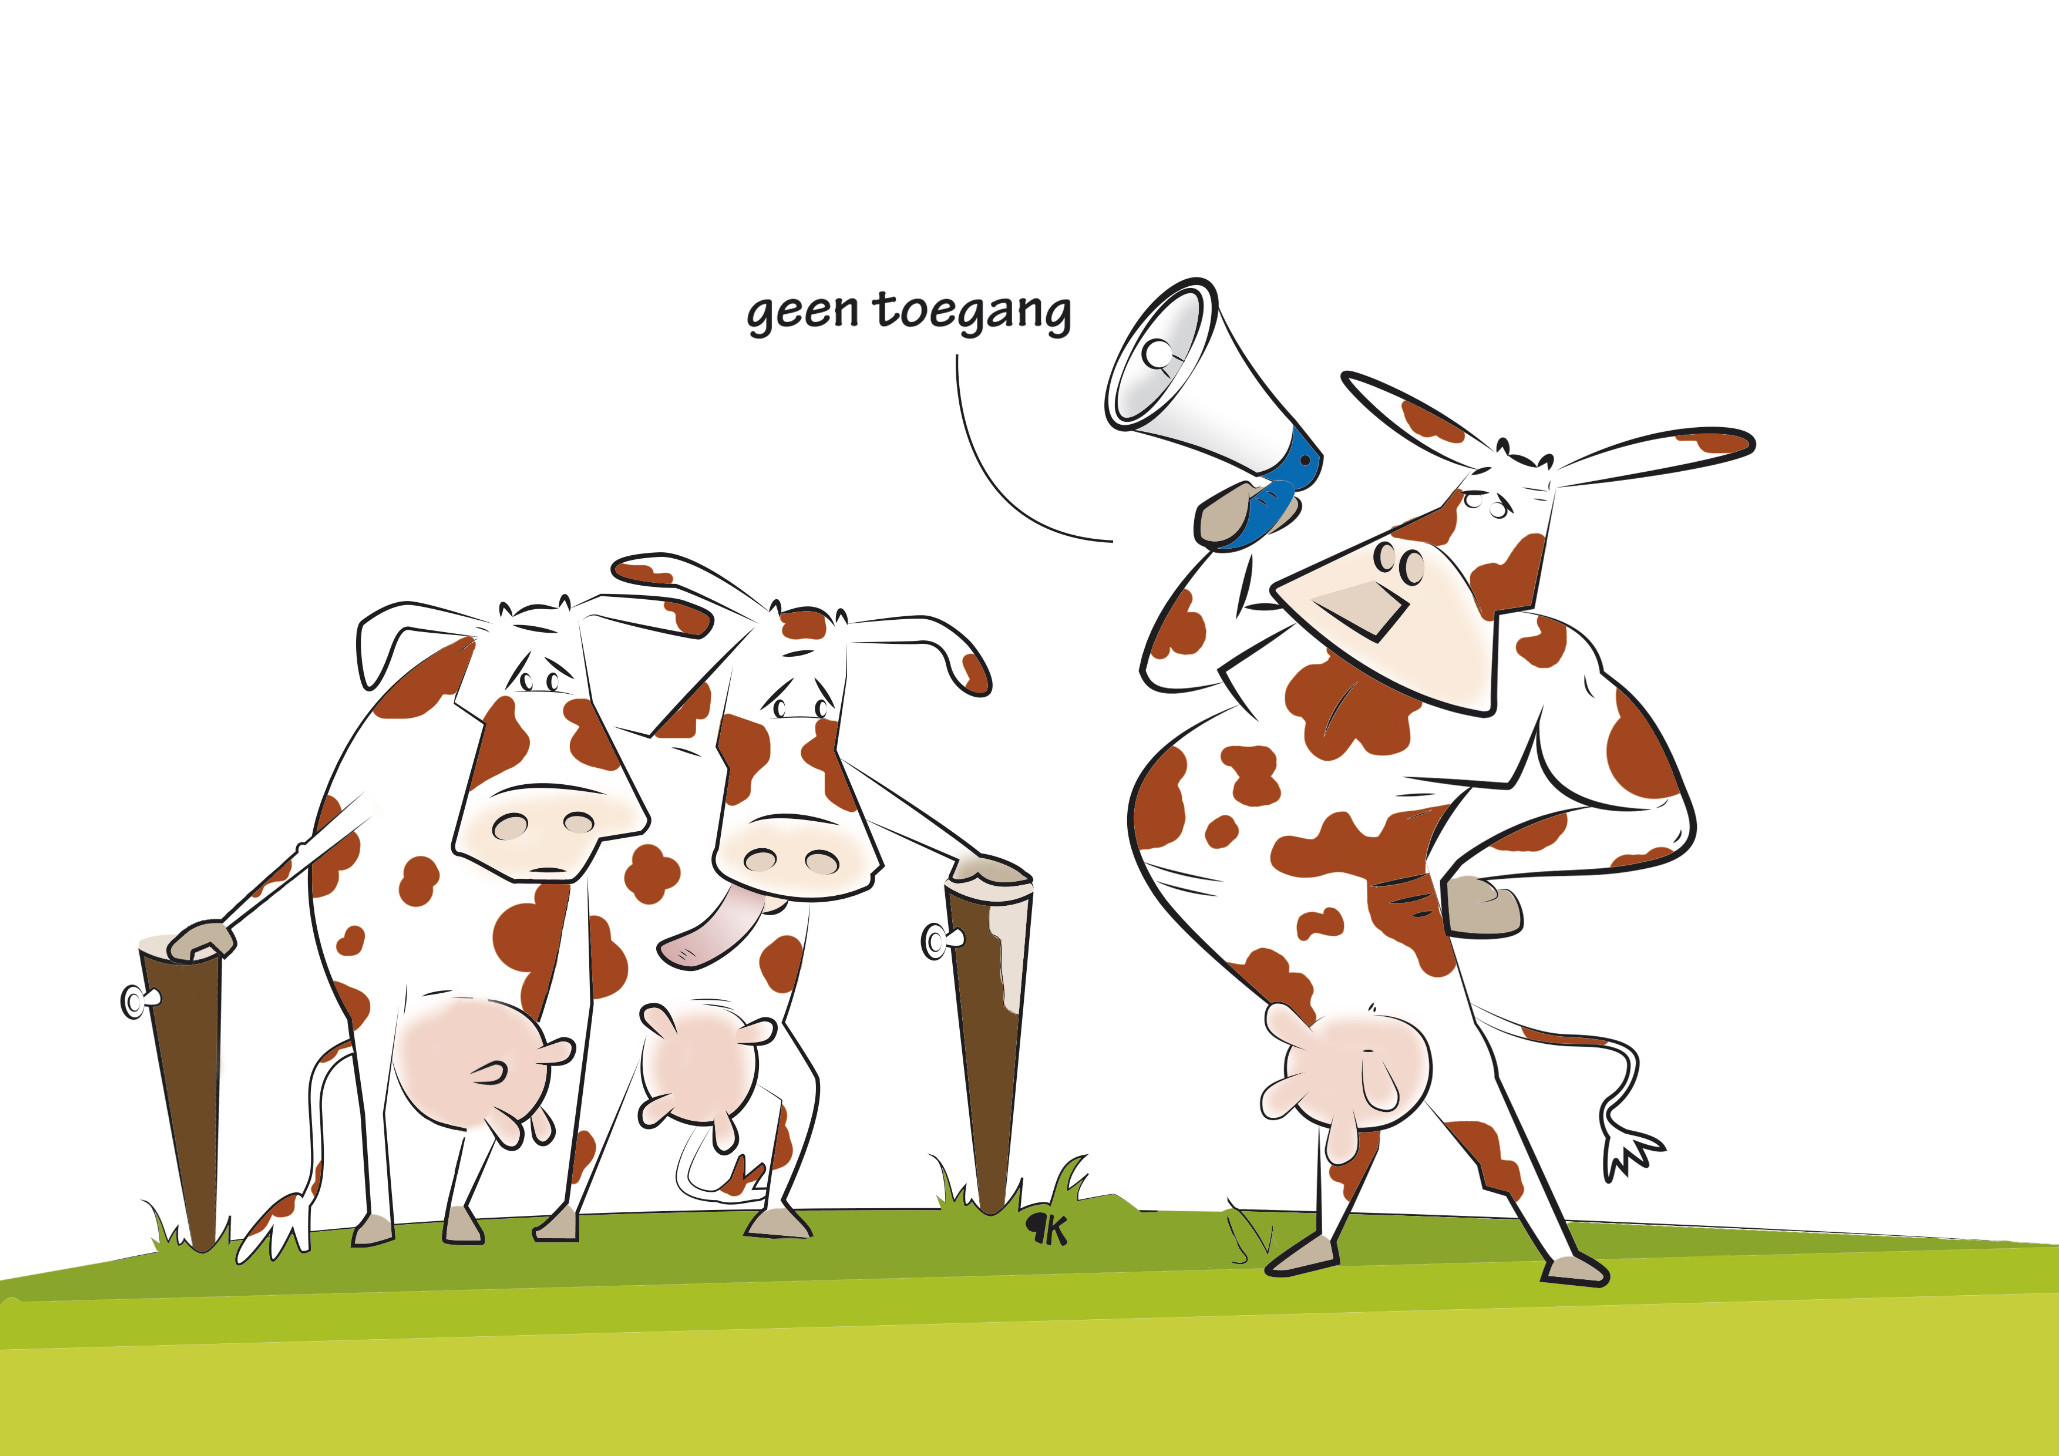 Lagere consumentvraag varkensvlees zet afzet onder druk